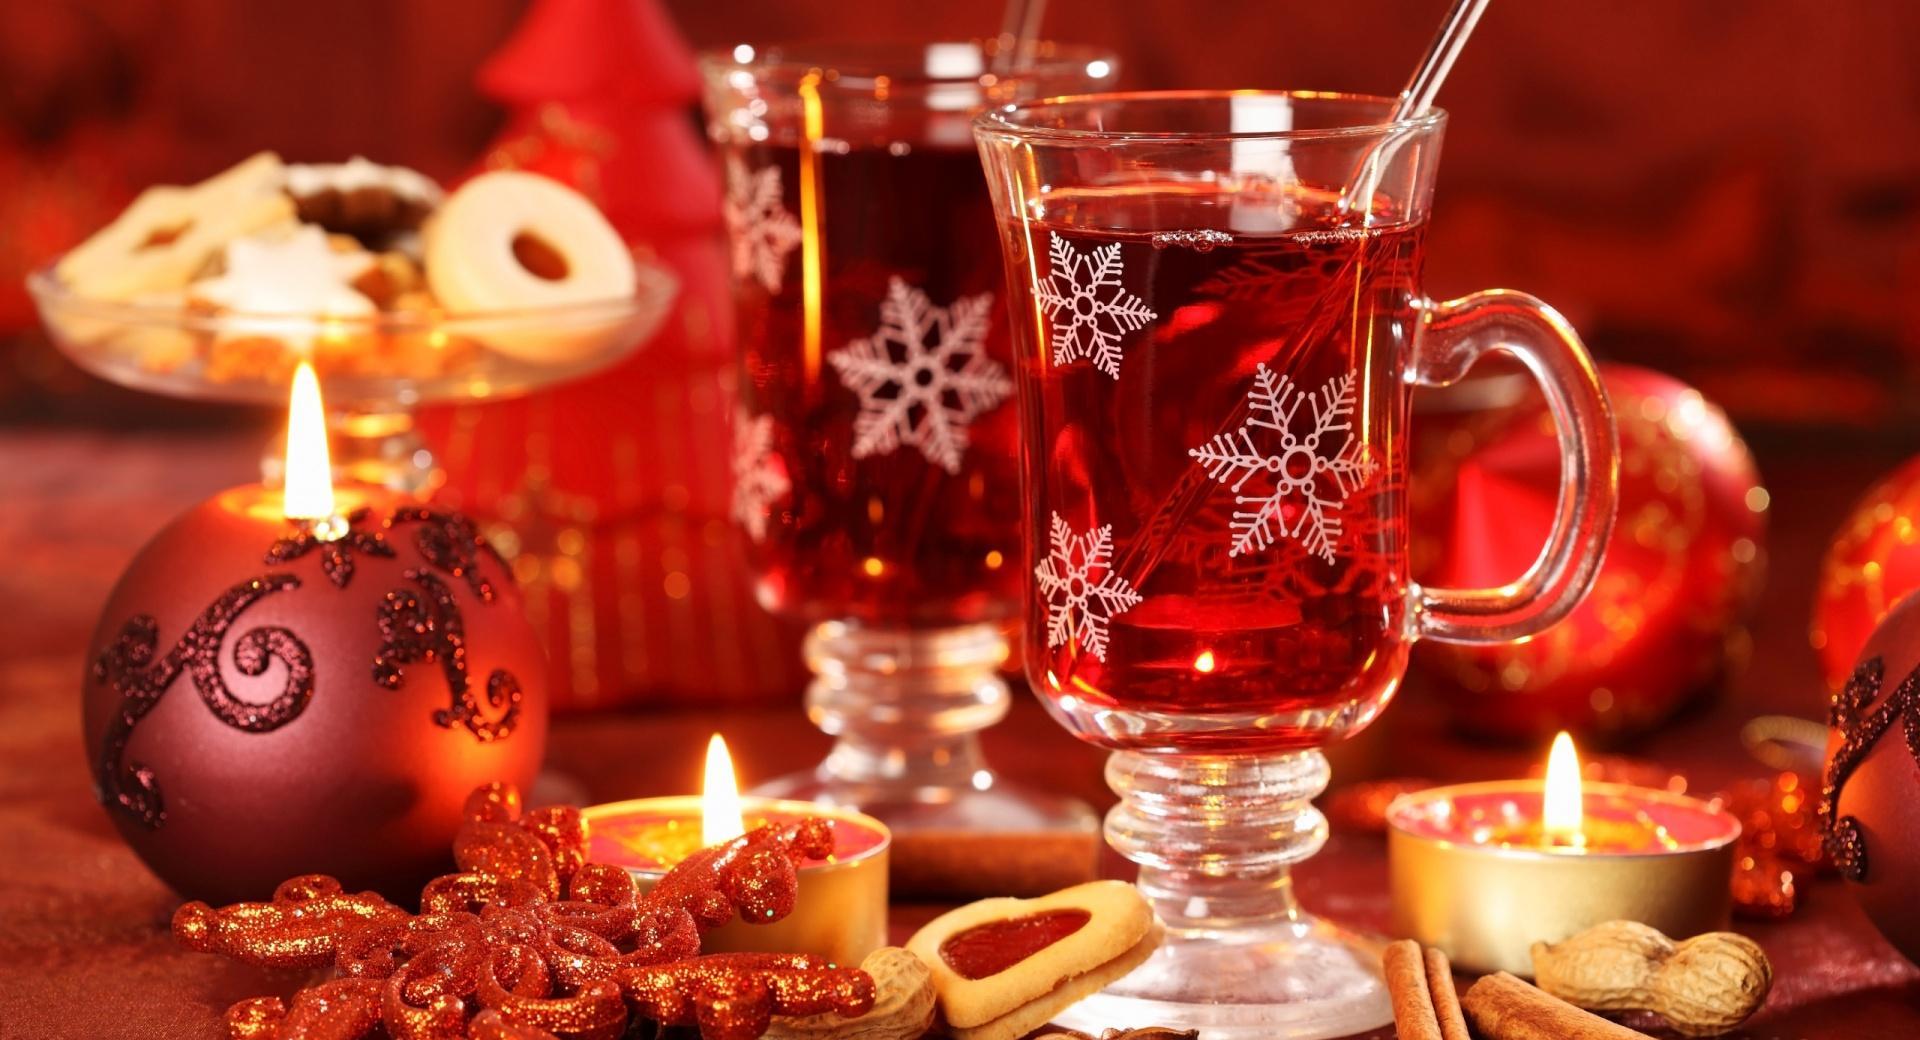 Hot Christmas Tea wallpapers HD quality